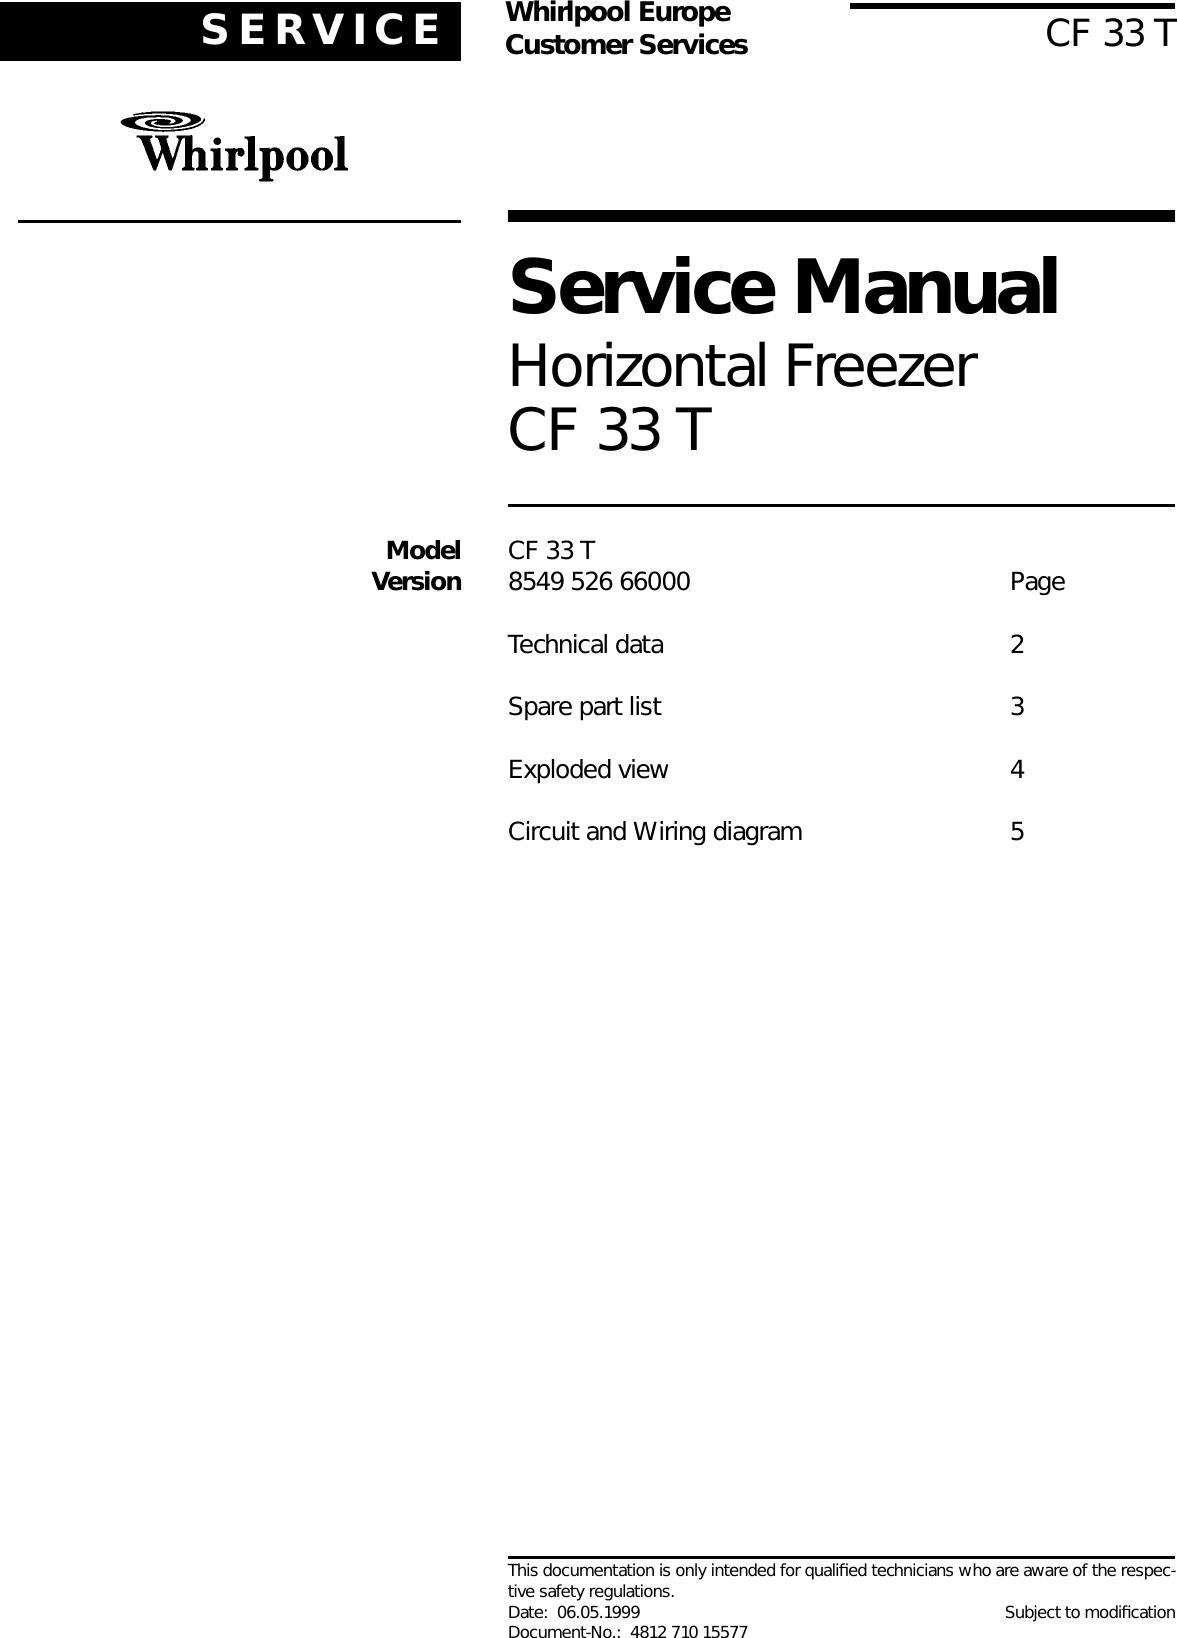 Whirlpool Freezer 33 Users Manual Wiring Diagram